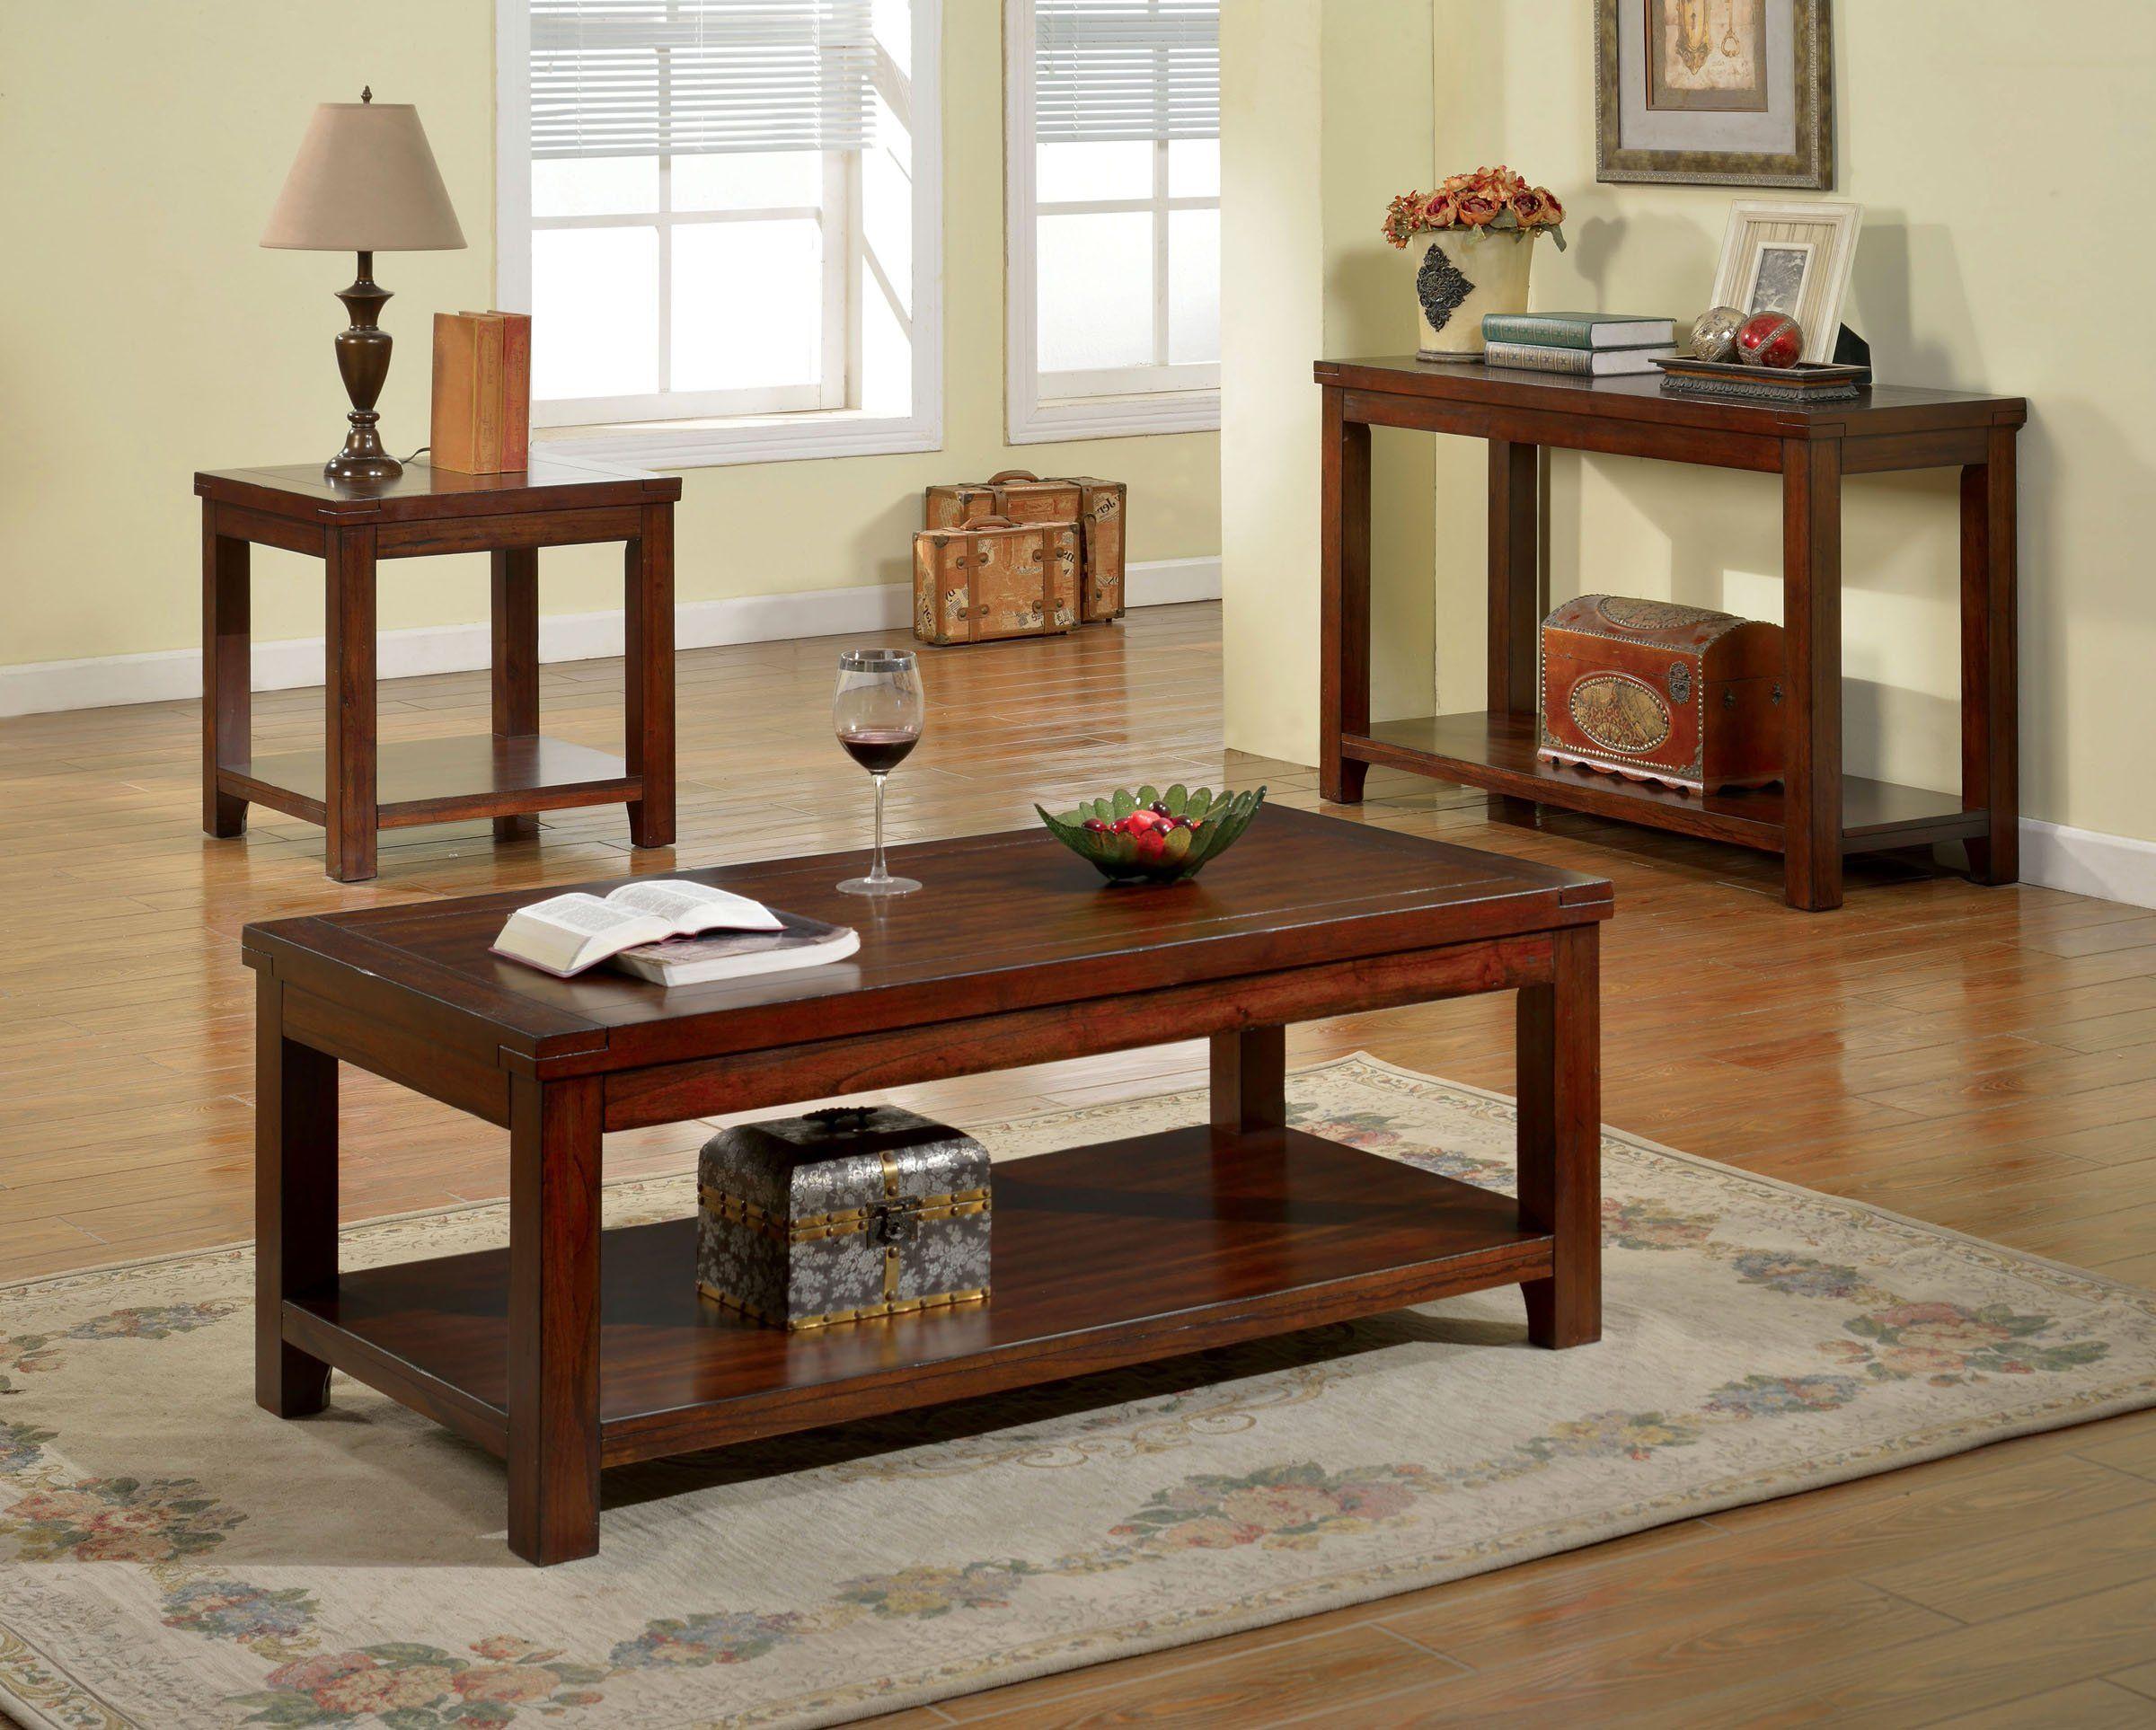 Furniture Of America Cm4107c Estell 3 Pieces Coffee Table Set 3